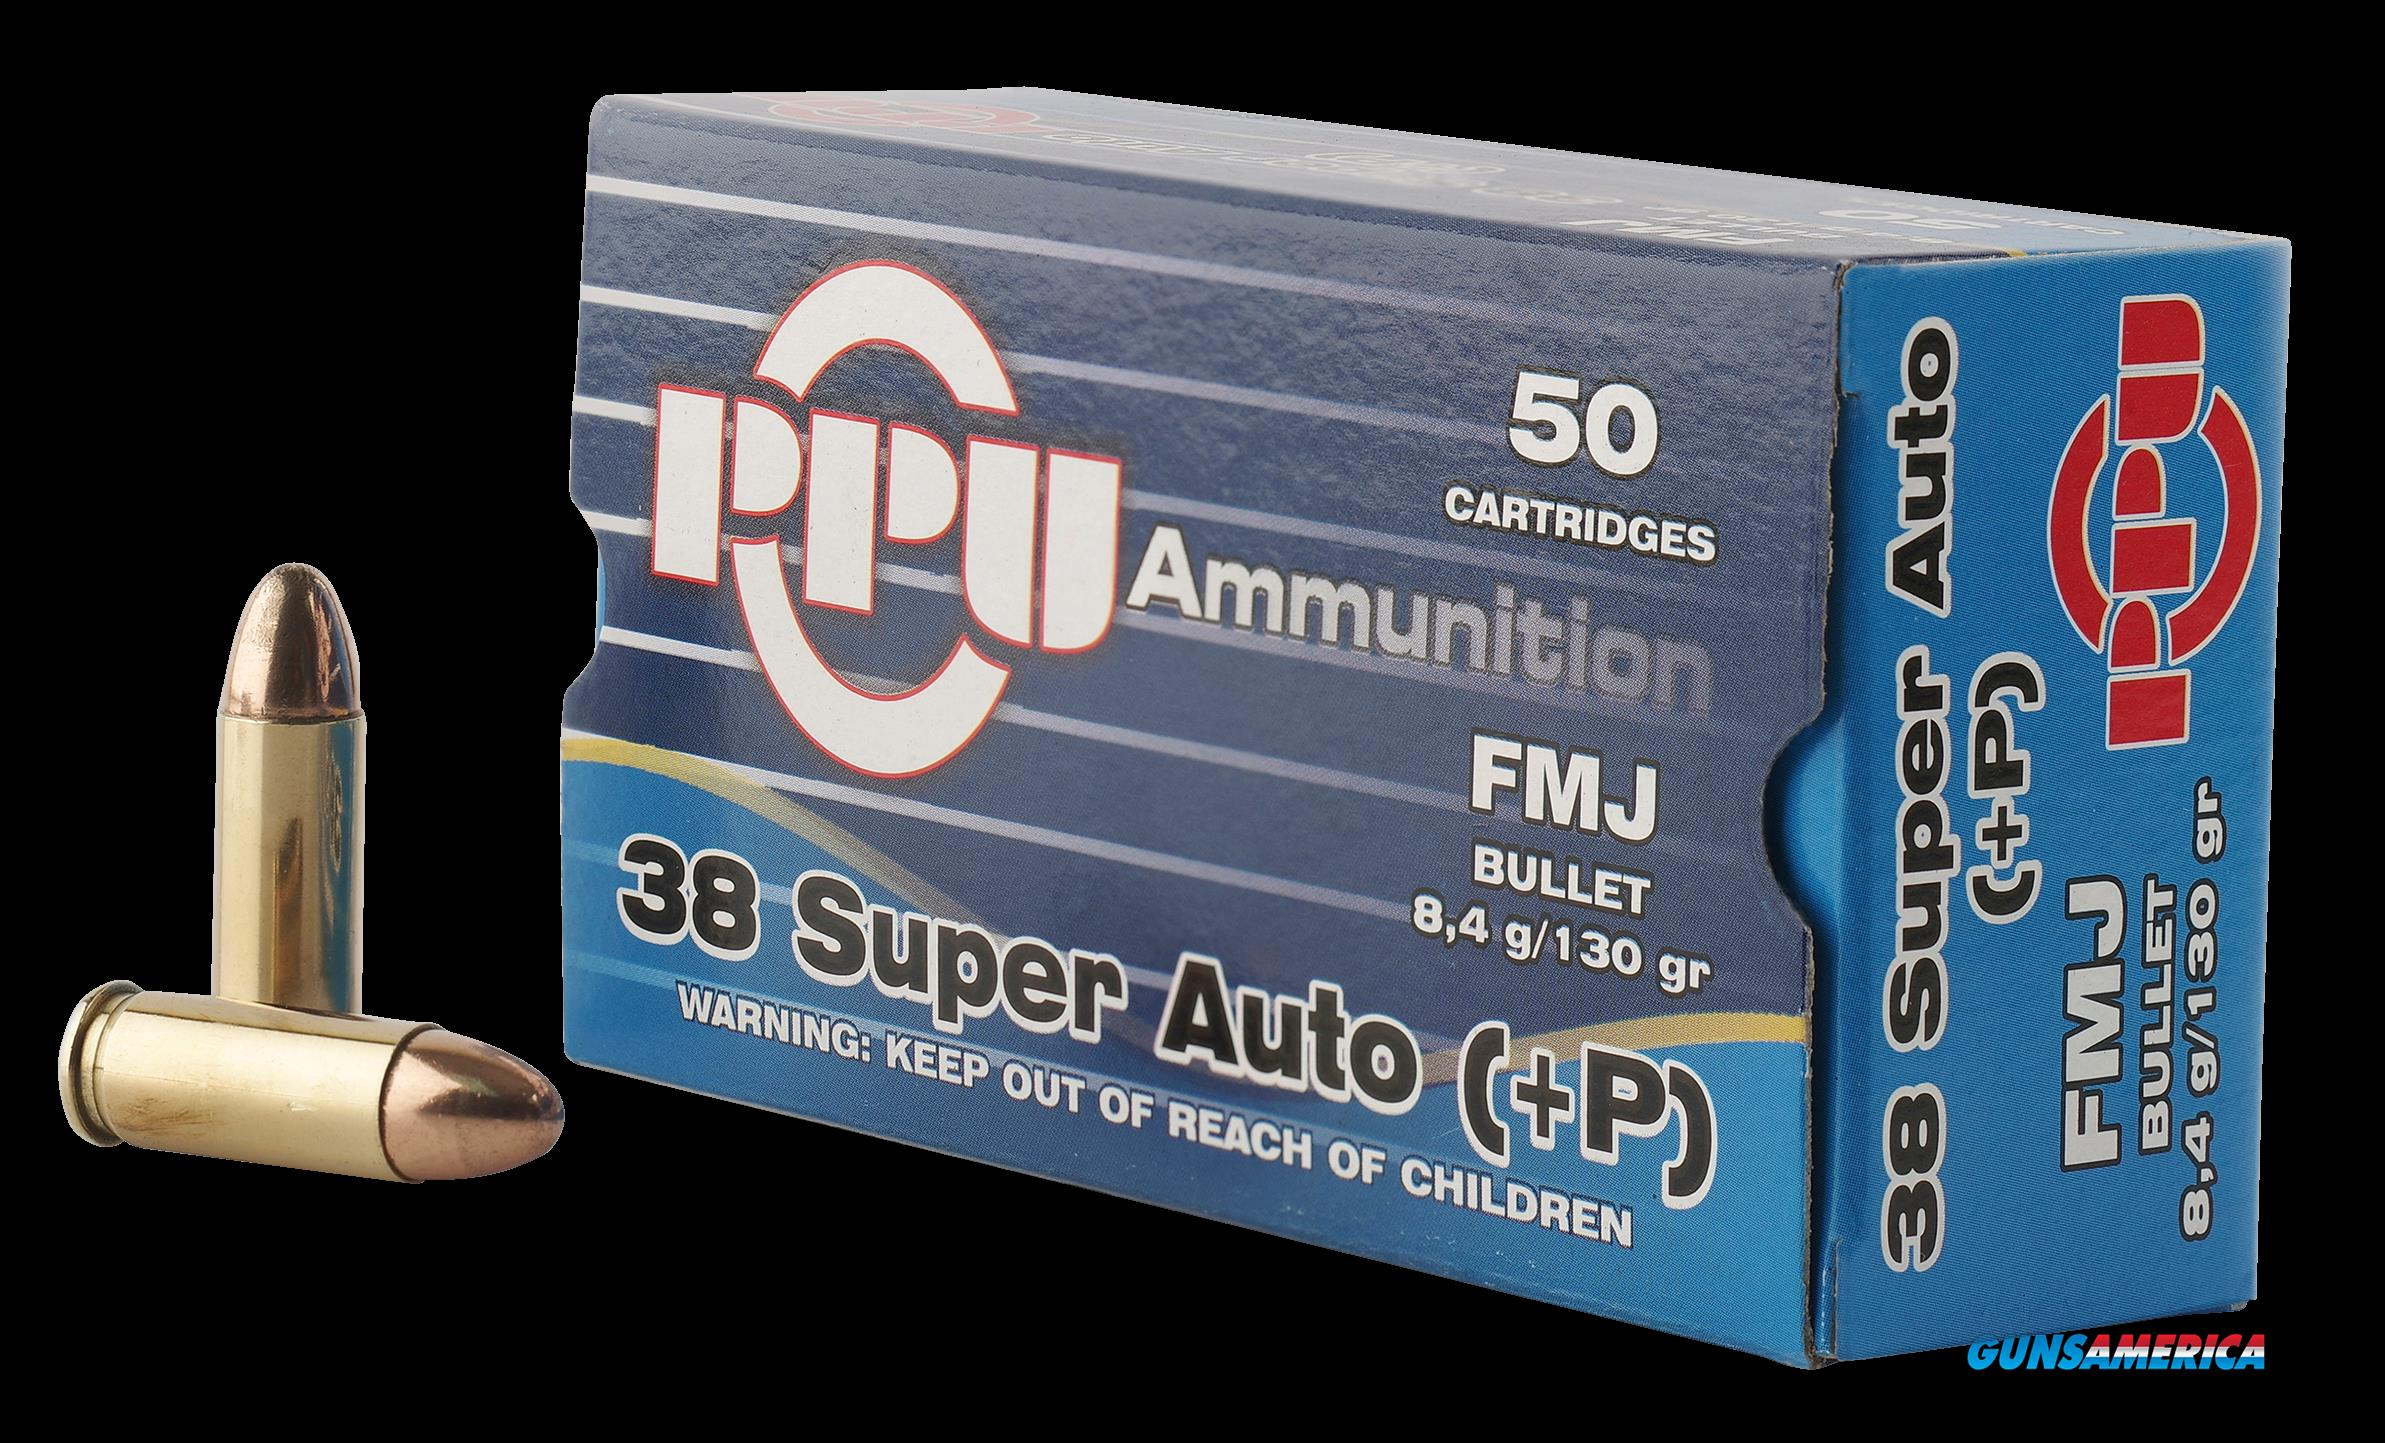 Ppu Handgun, Ppu Pph38su     38sup+p     130 Fmj          50-10  Guns > Pistols > 1911 Pistol Copies (non-Colt)